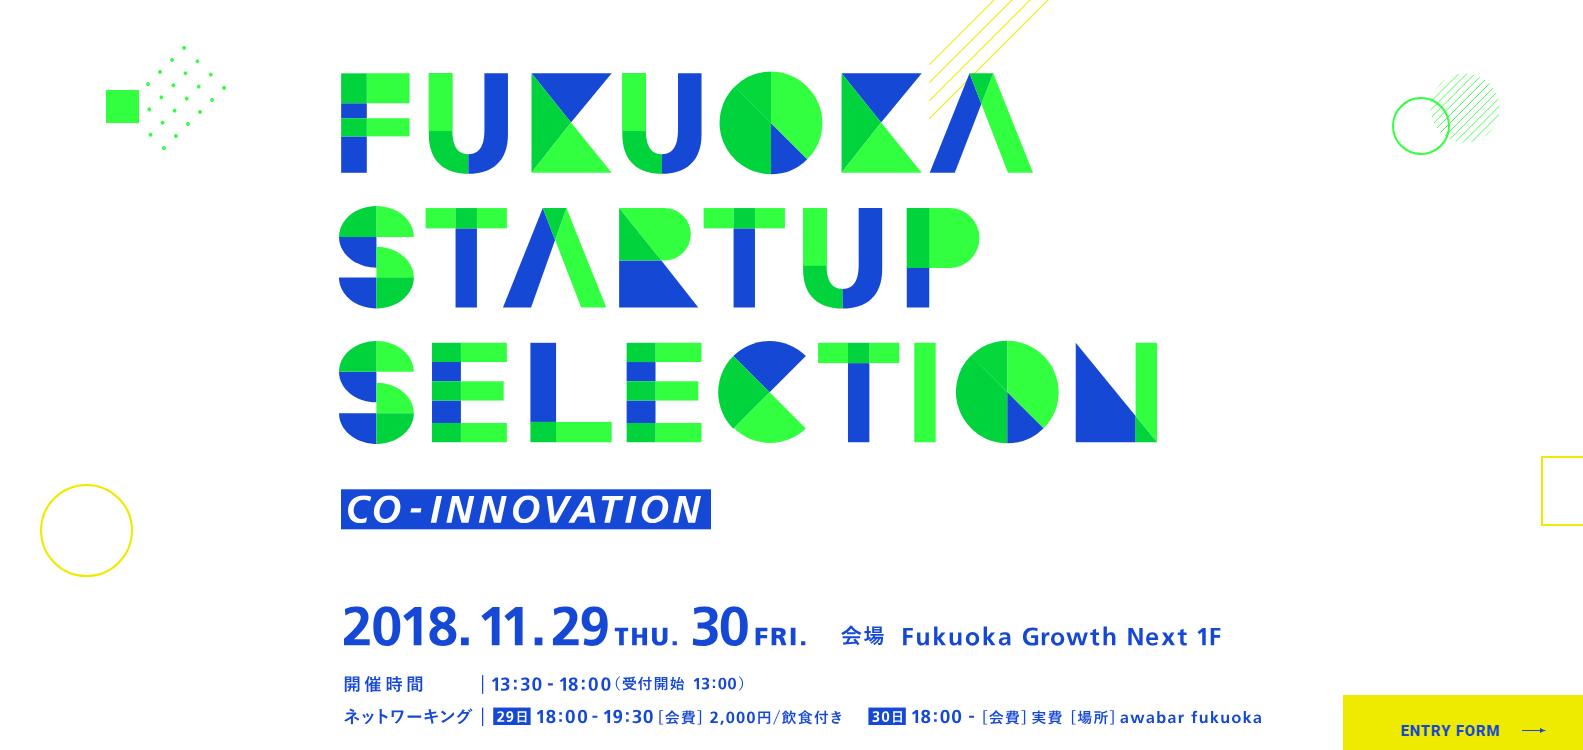 FUKUOKA STARTUP SELECTION